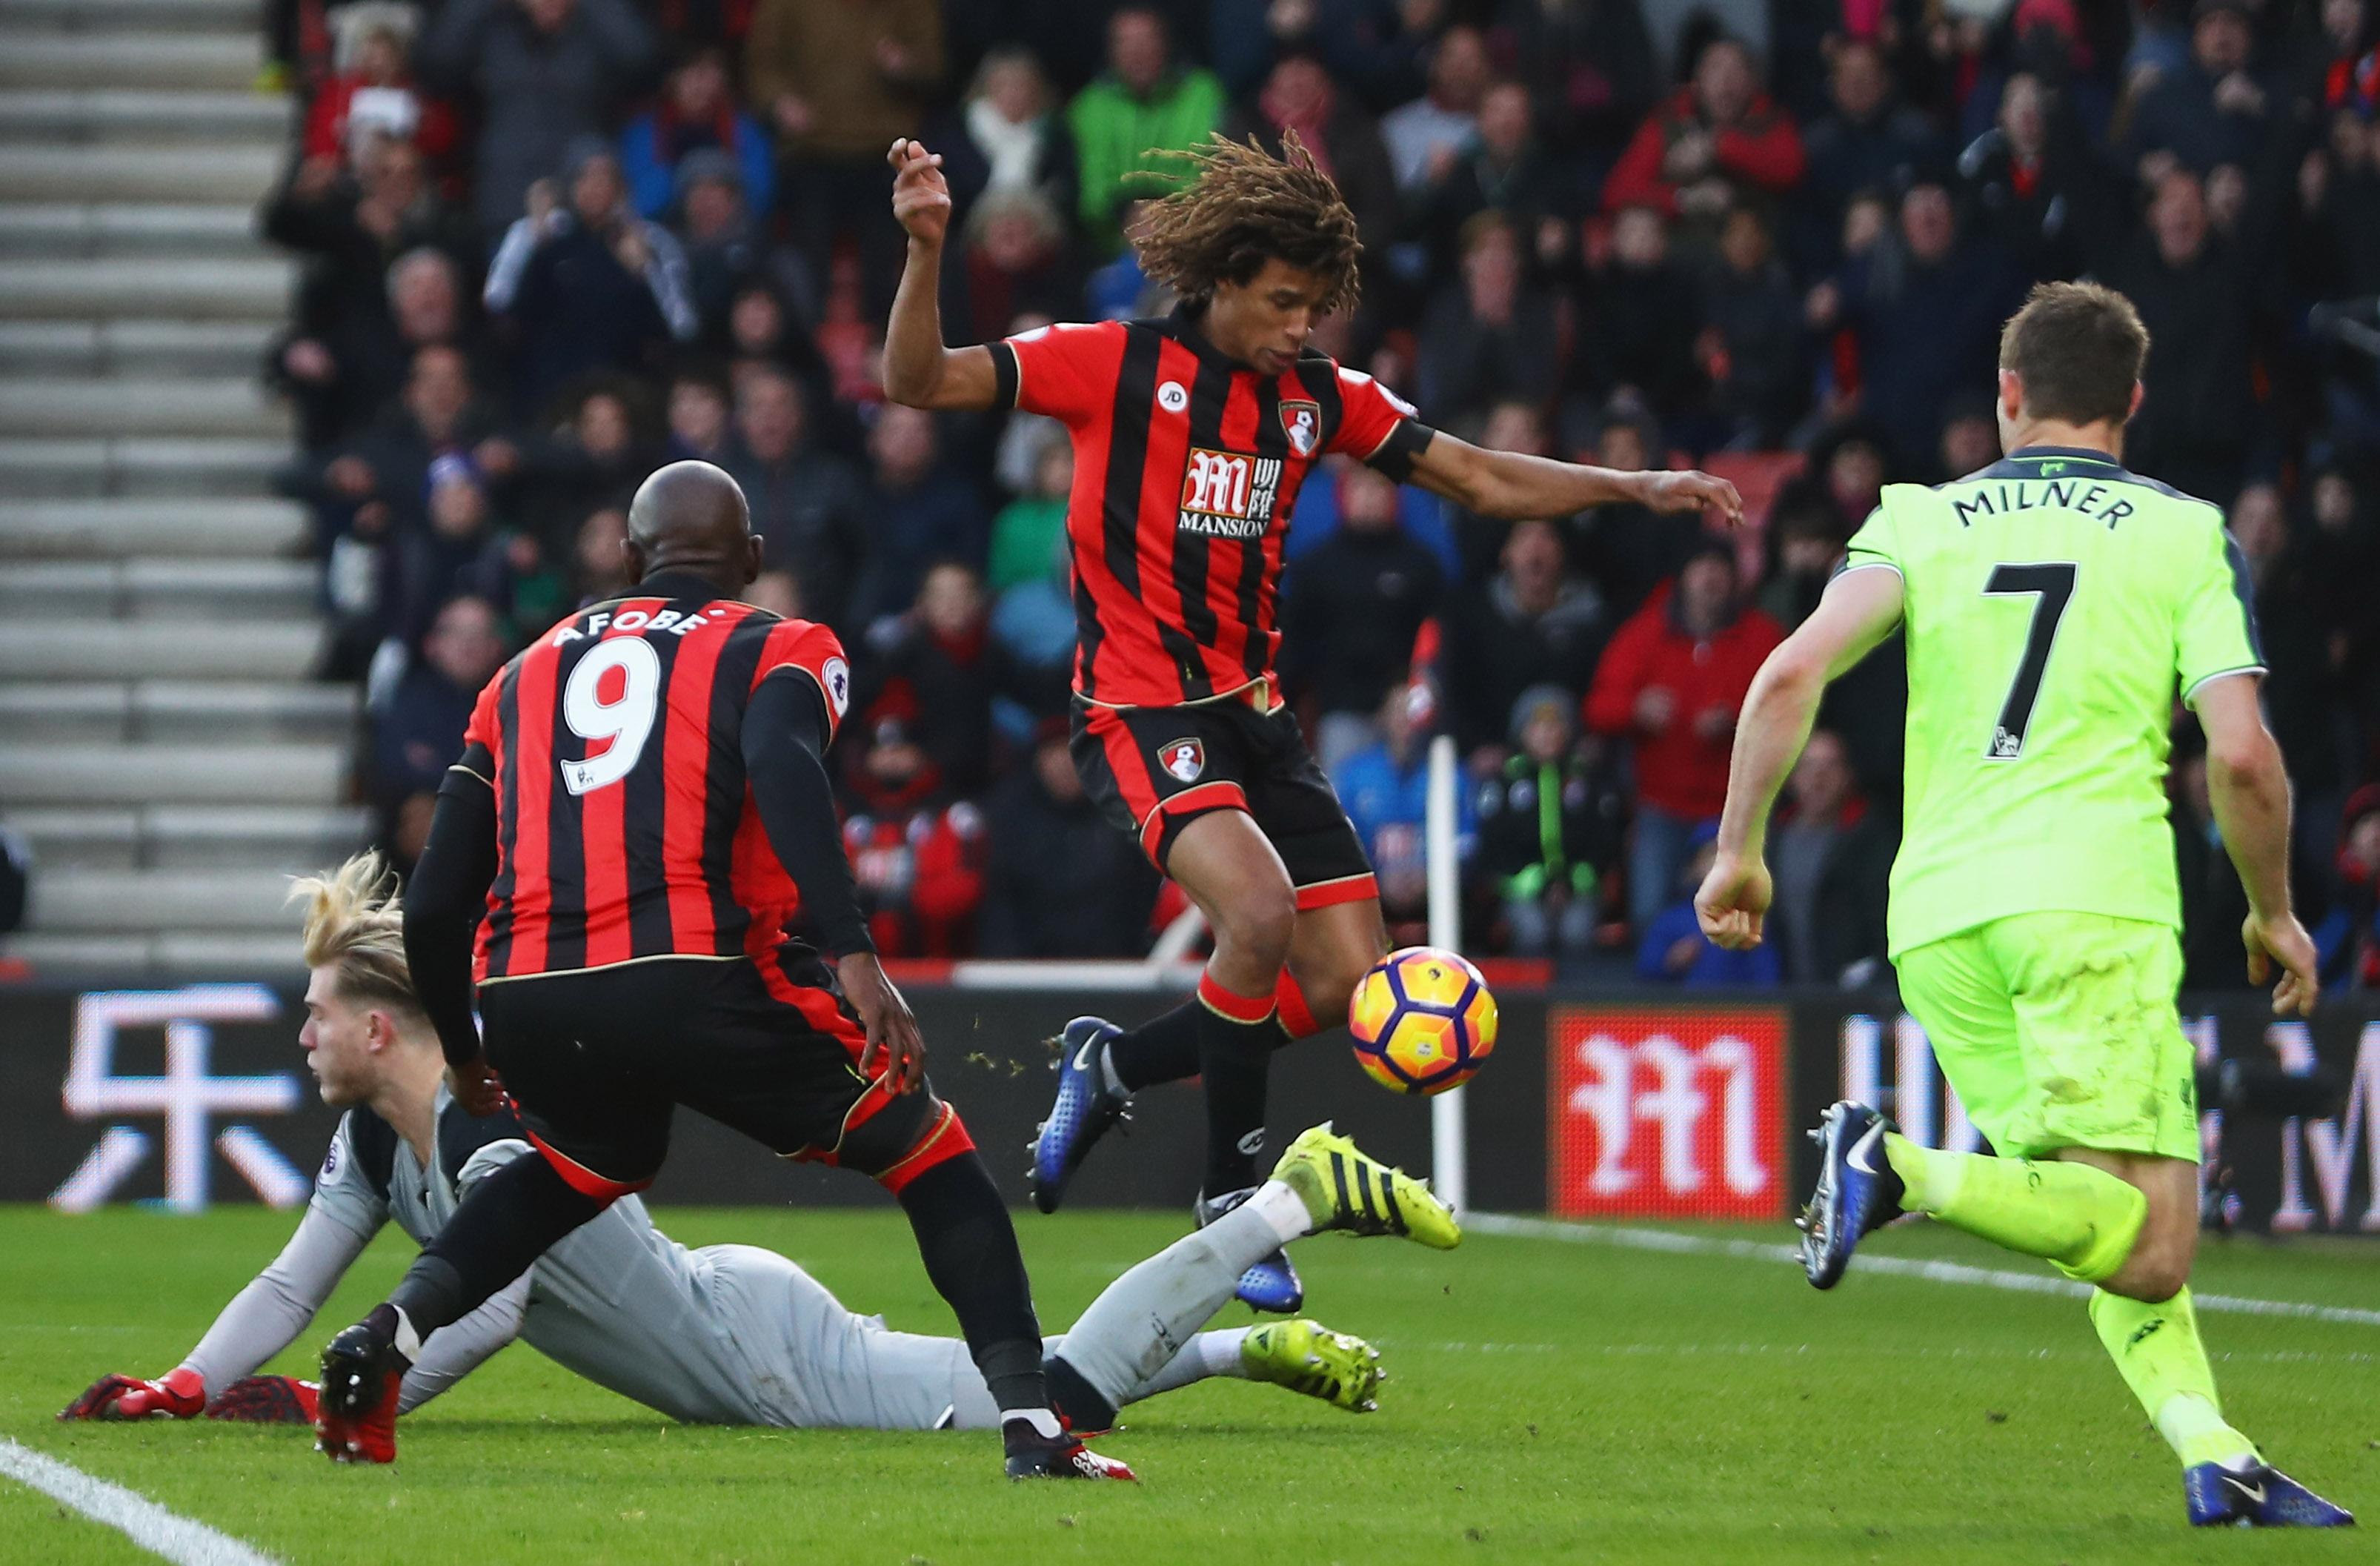 Nhận định, soi kèo Liverpool vs Bournemouth – 07/03/2020